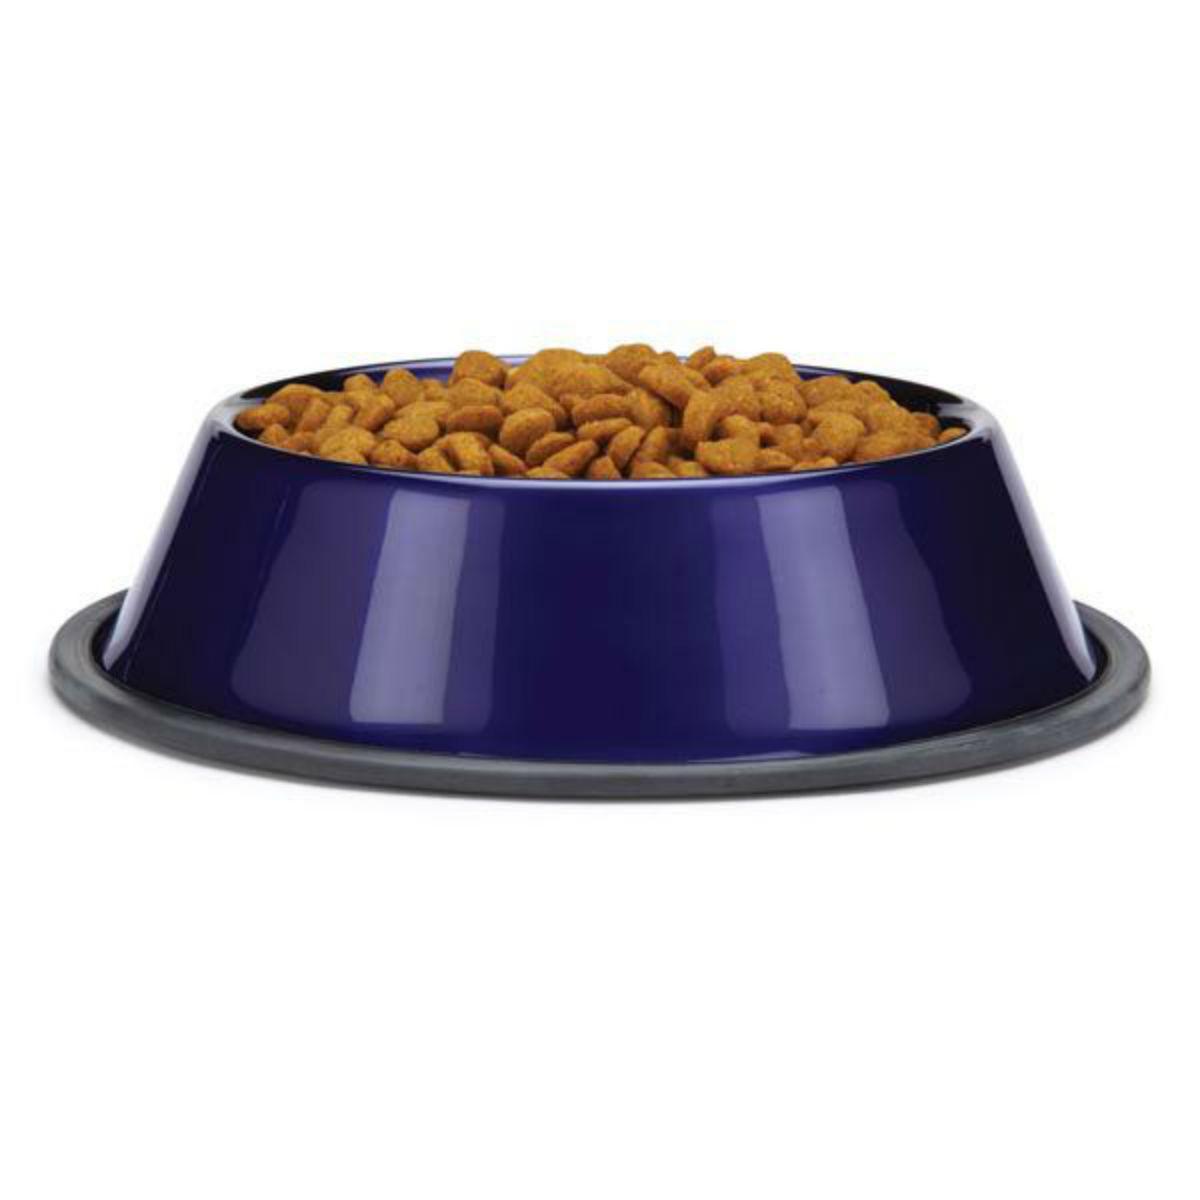 ProSelect DuraGloss Metallic Stainless Steel Dog Bowl - Amethyst